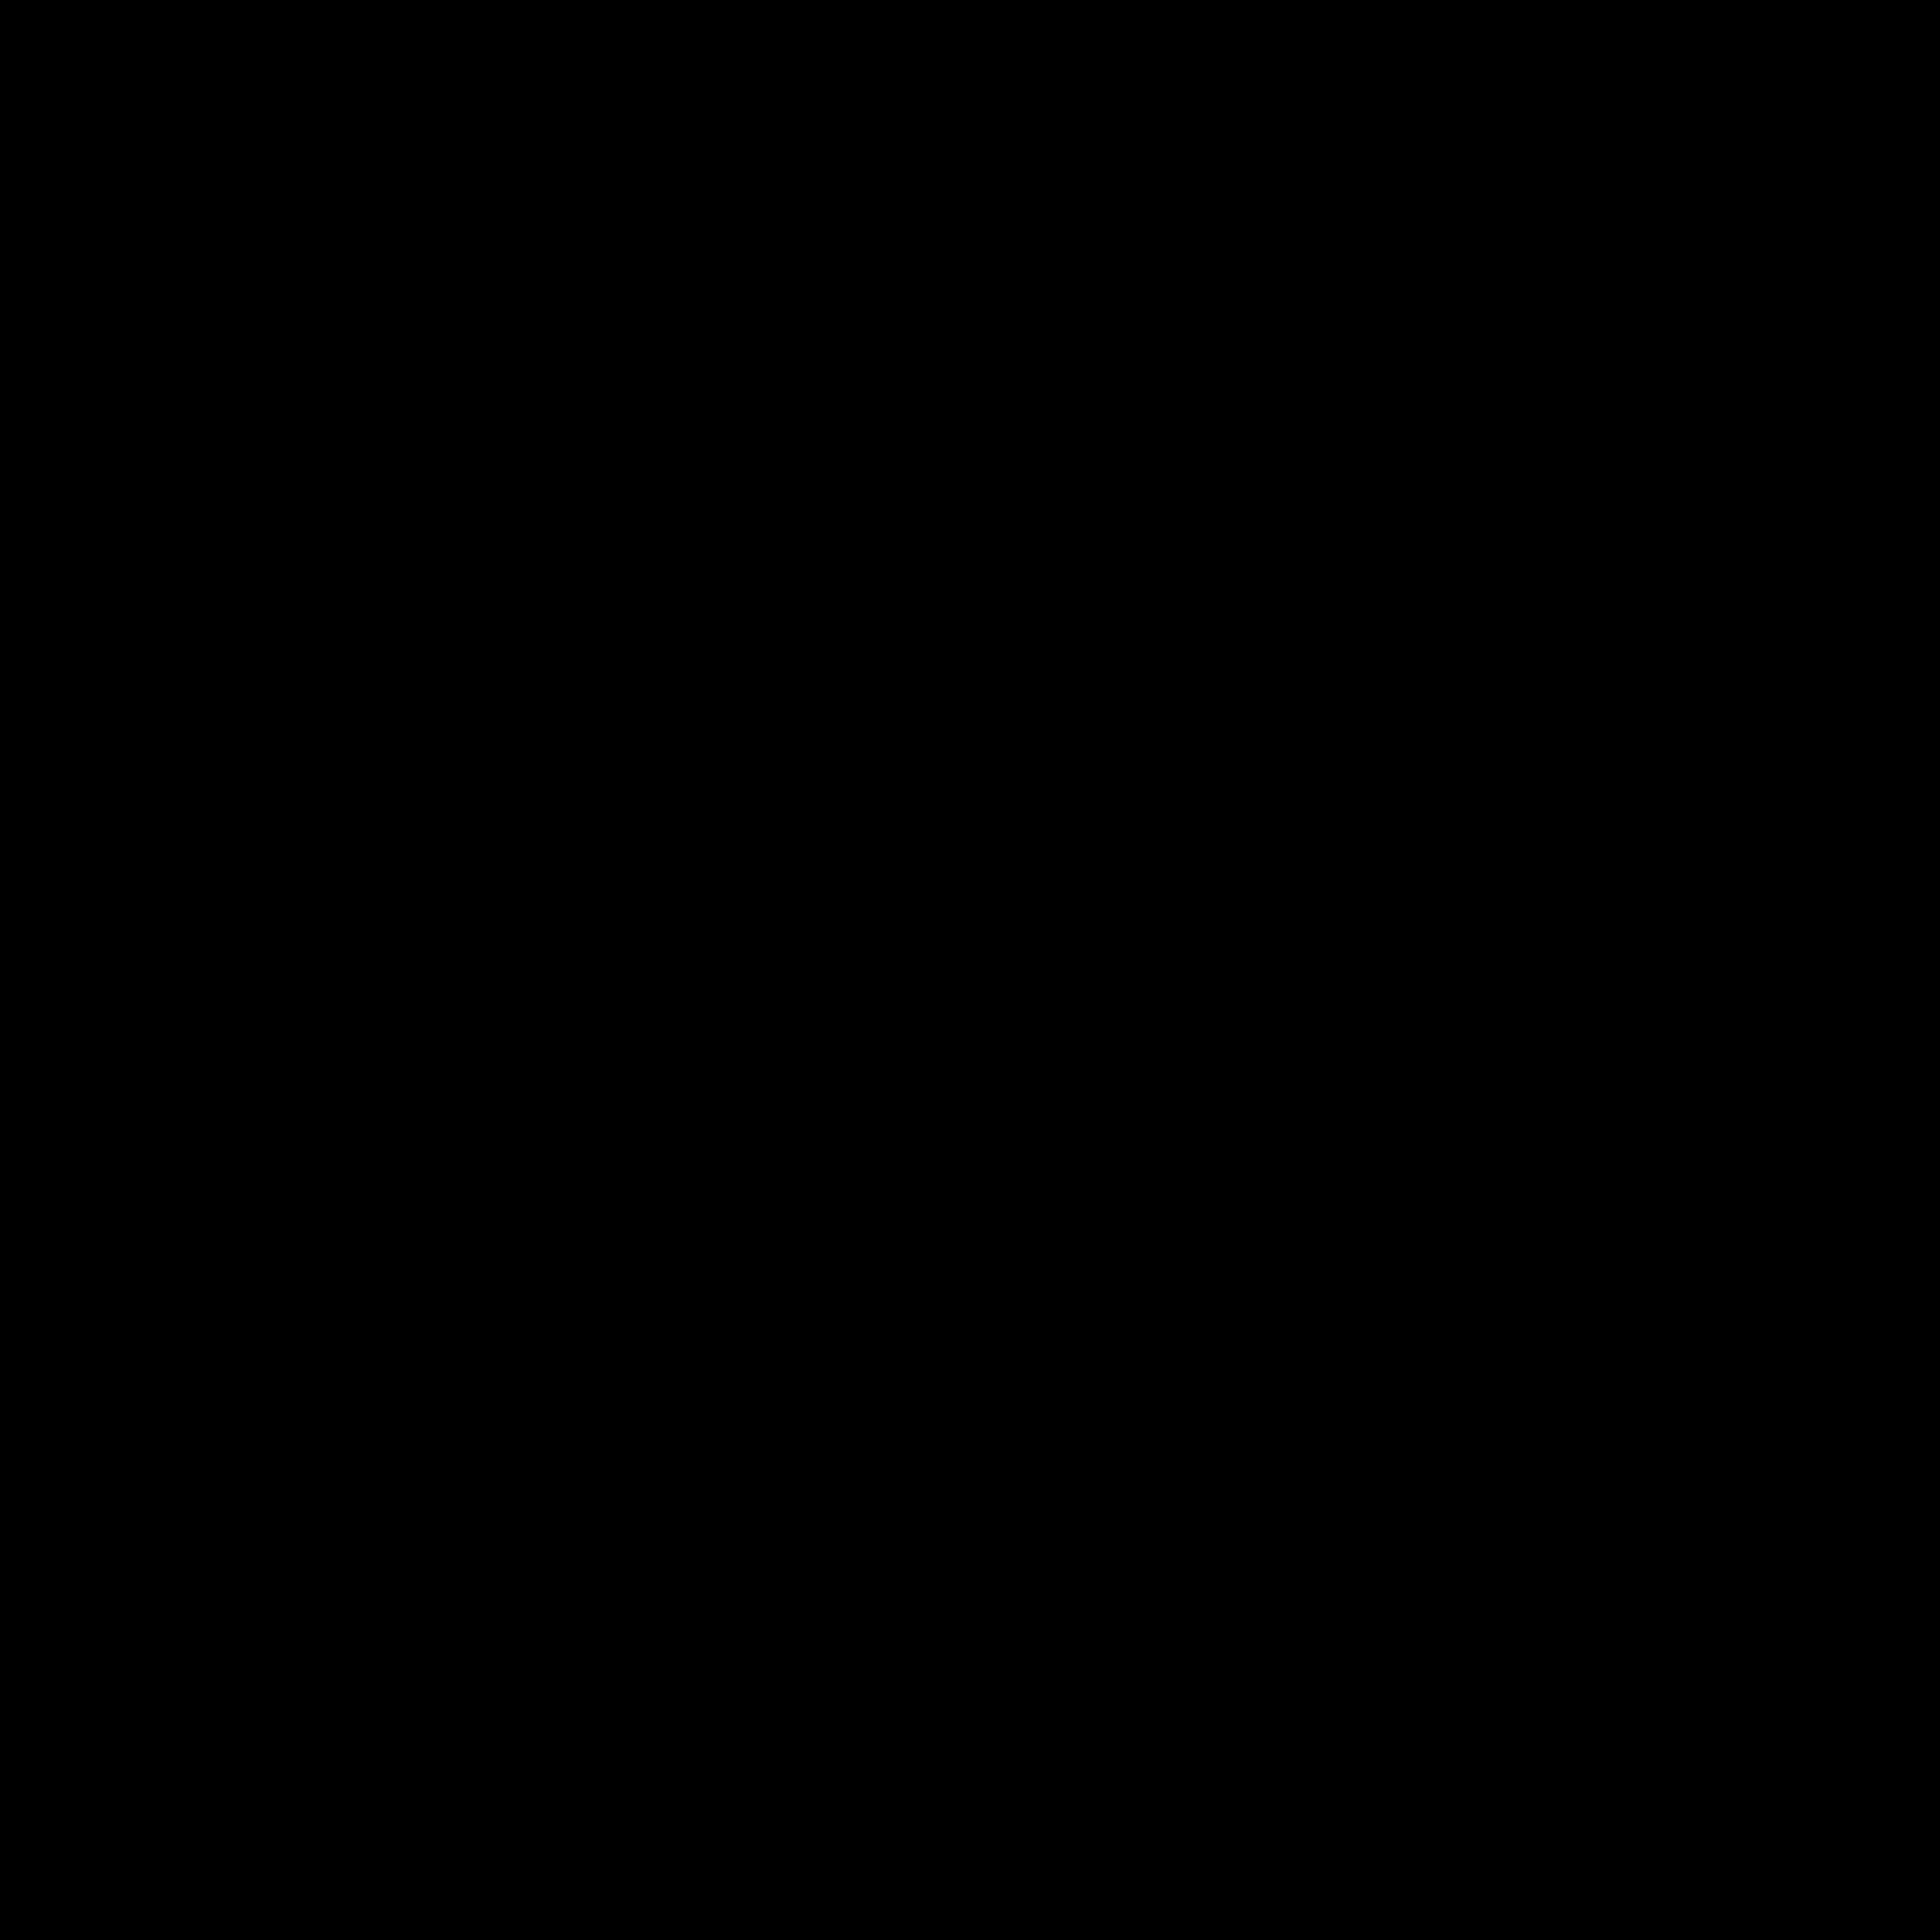 transparent black square - HD1500×1500